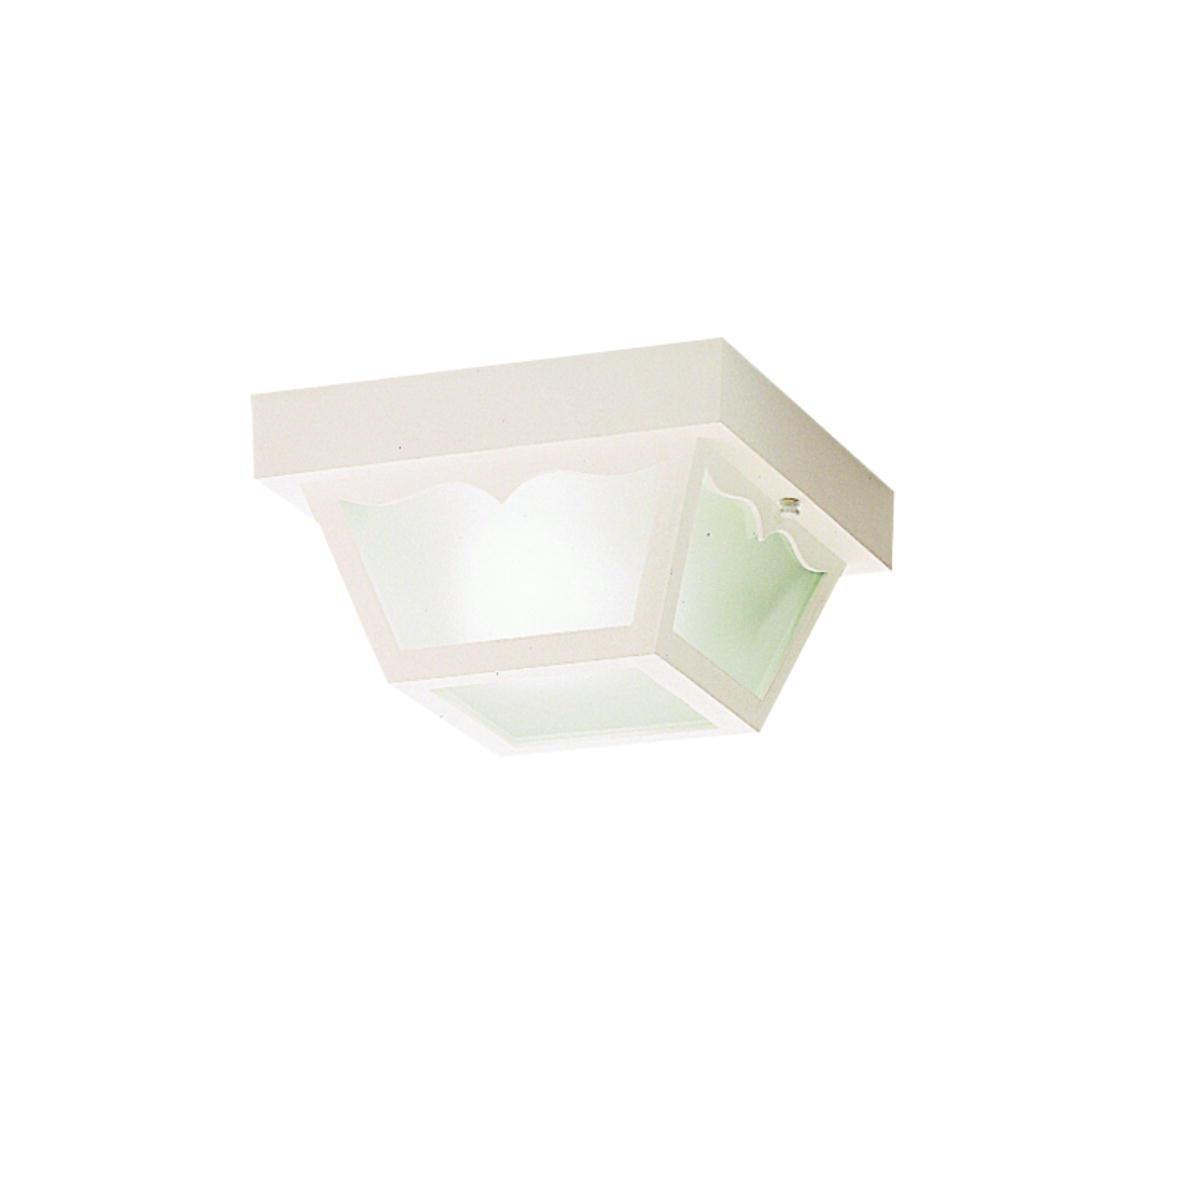 Inspiration about Plastic Outdoor Ceiling Lights: Deka Ingram Cm Silver Plastic Indoor In Plastic Outdoor Ceiling Lights (#11 of 15)